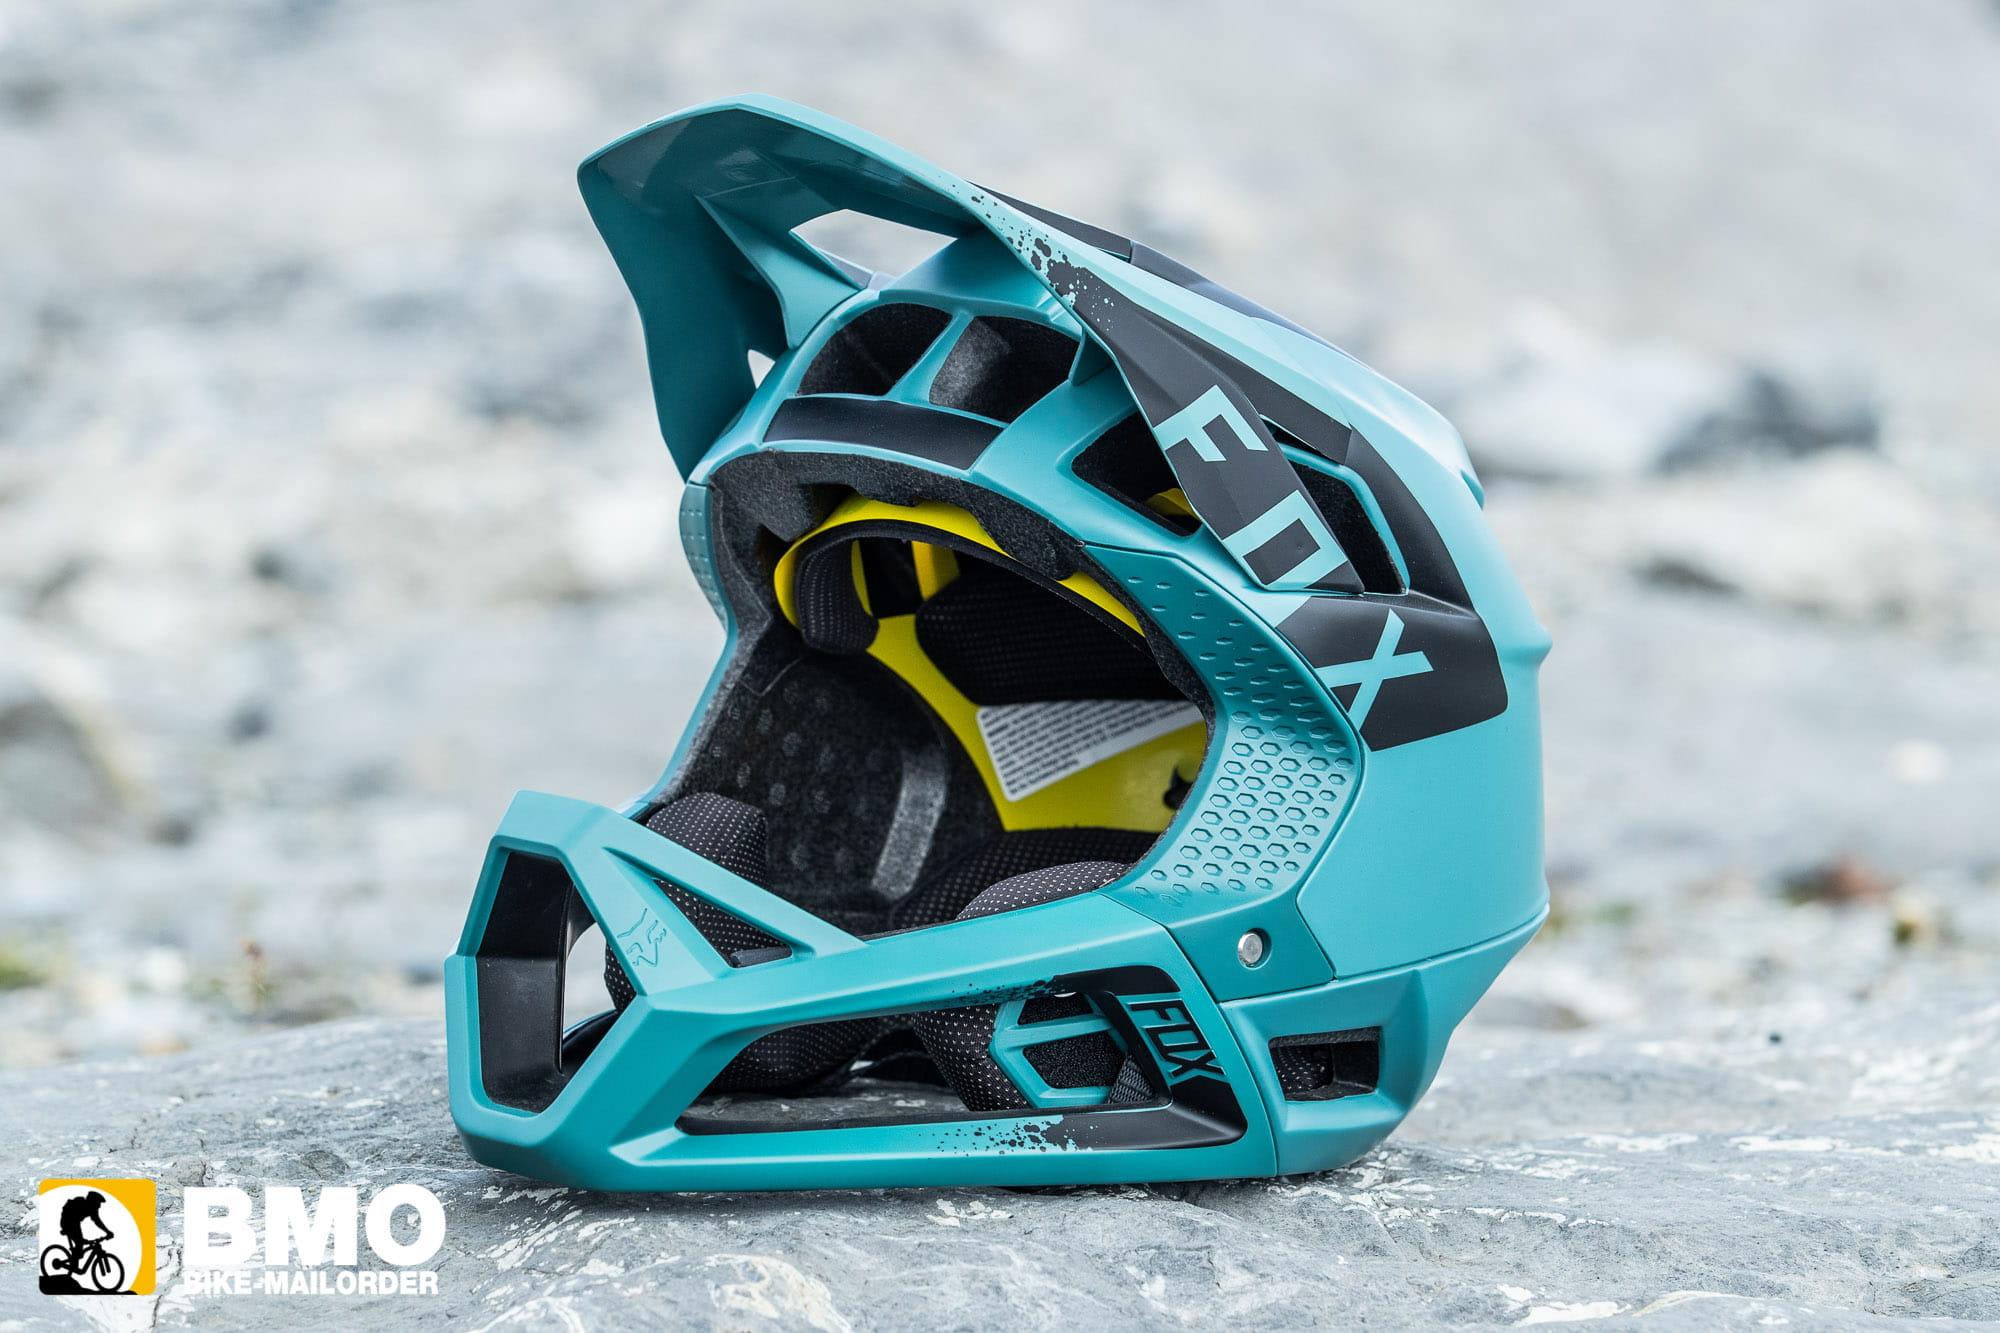 BMO-Bike-Mailorder-Fox-Proframe